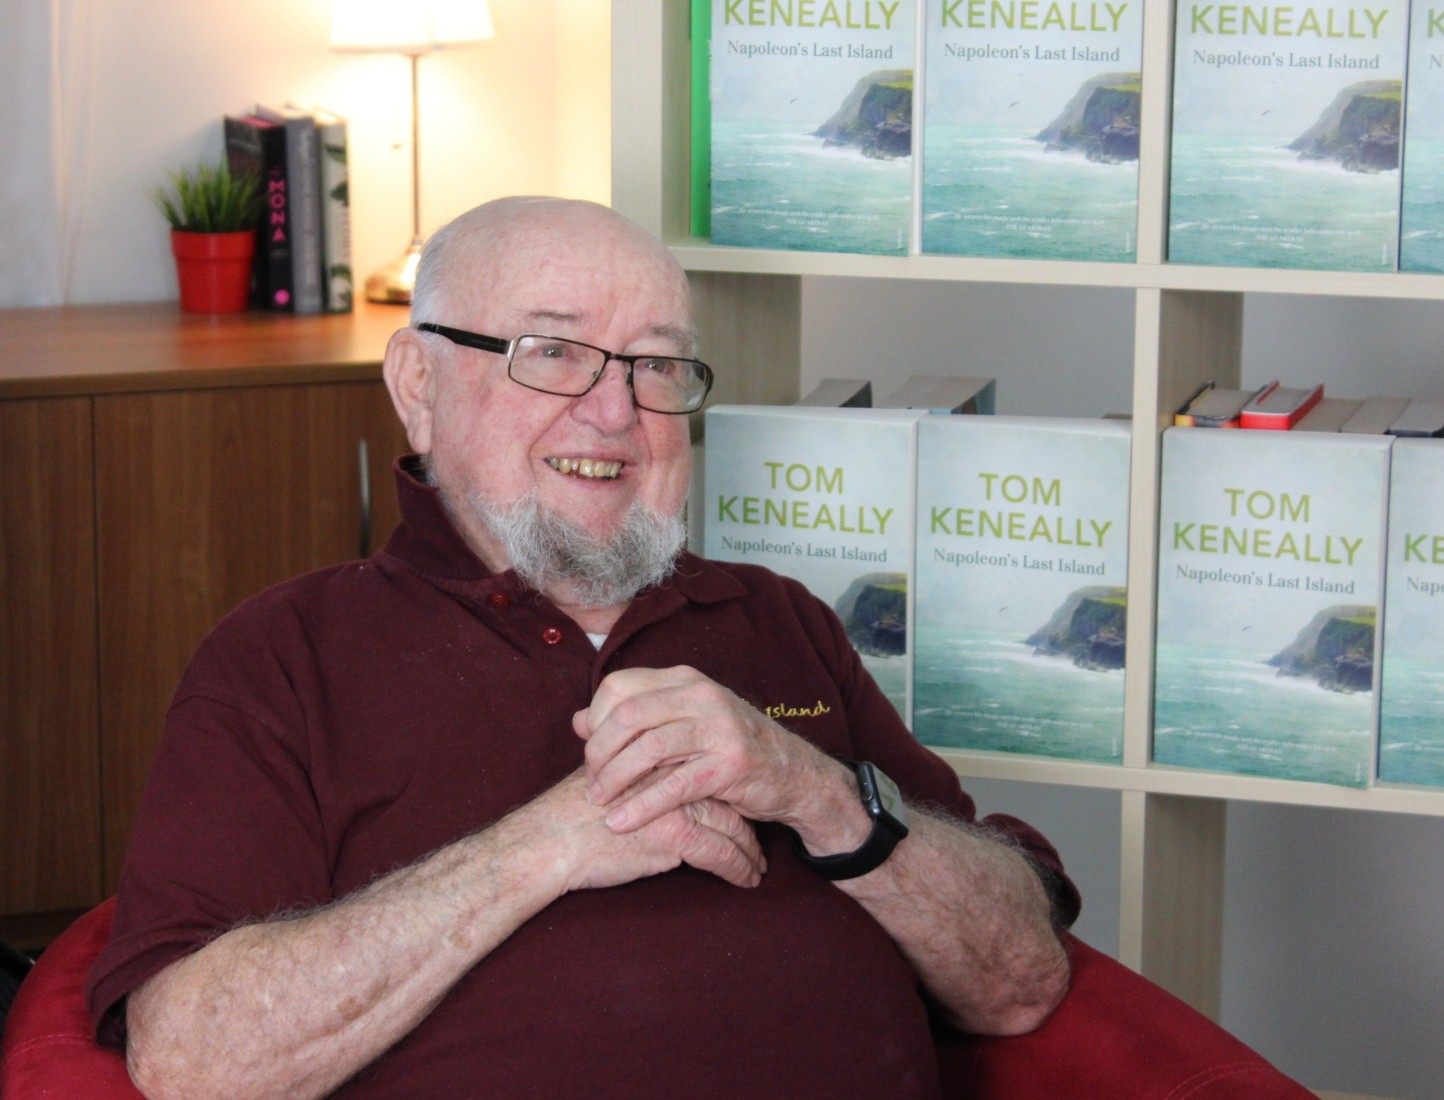 Tom Keneally